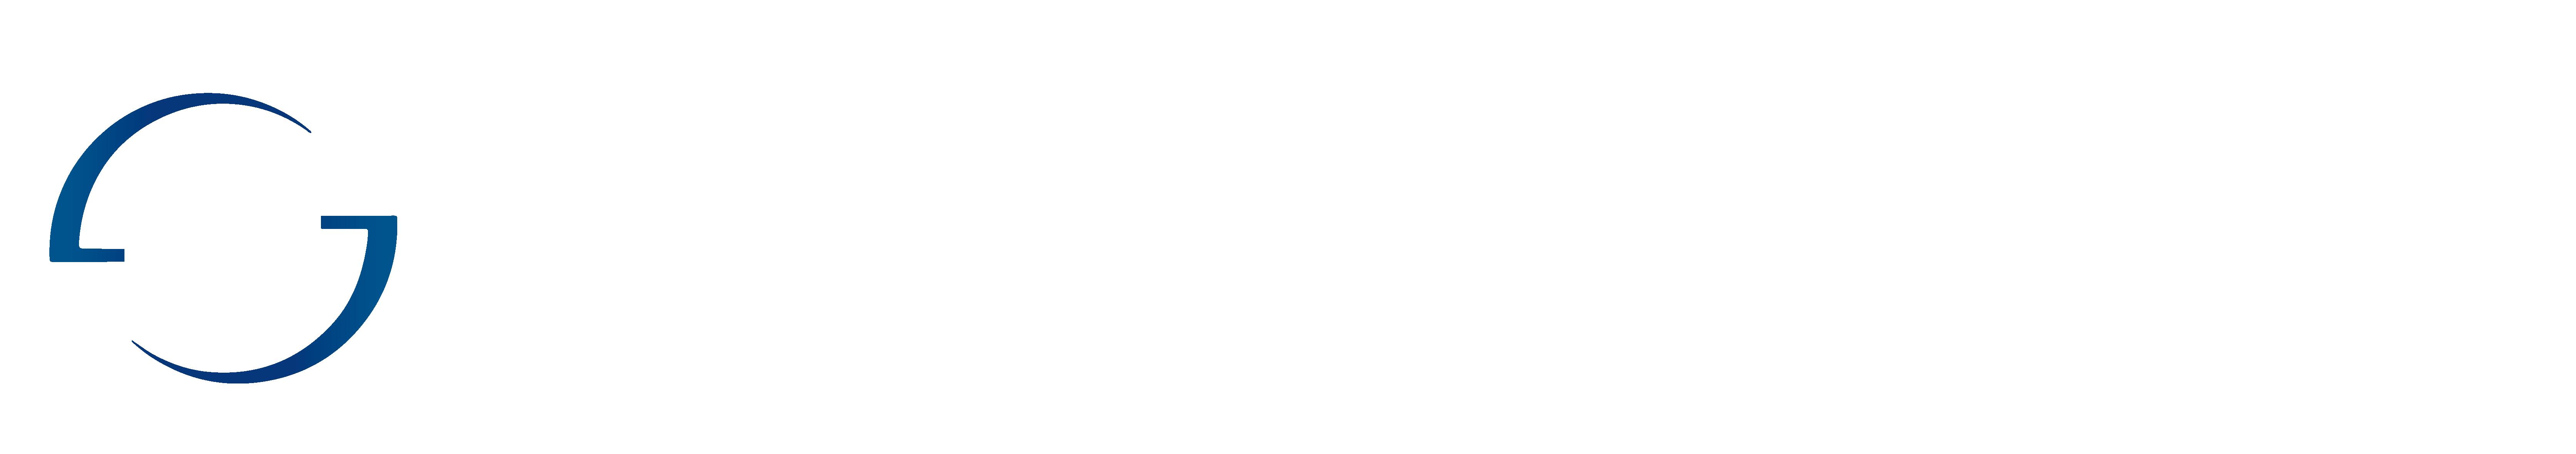 Banner Siesesp